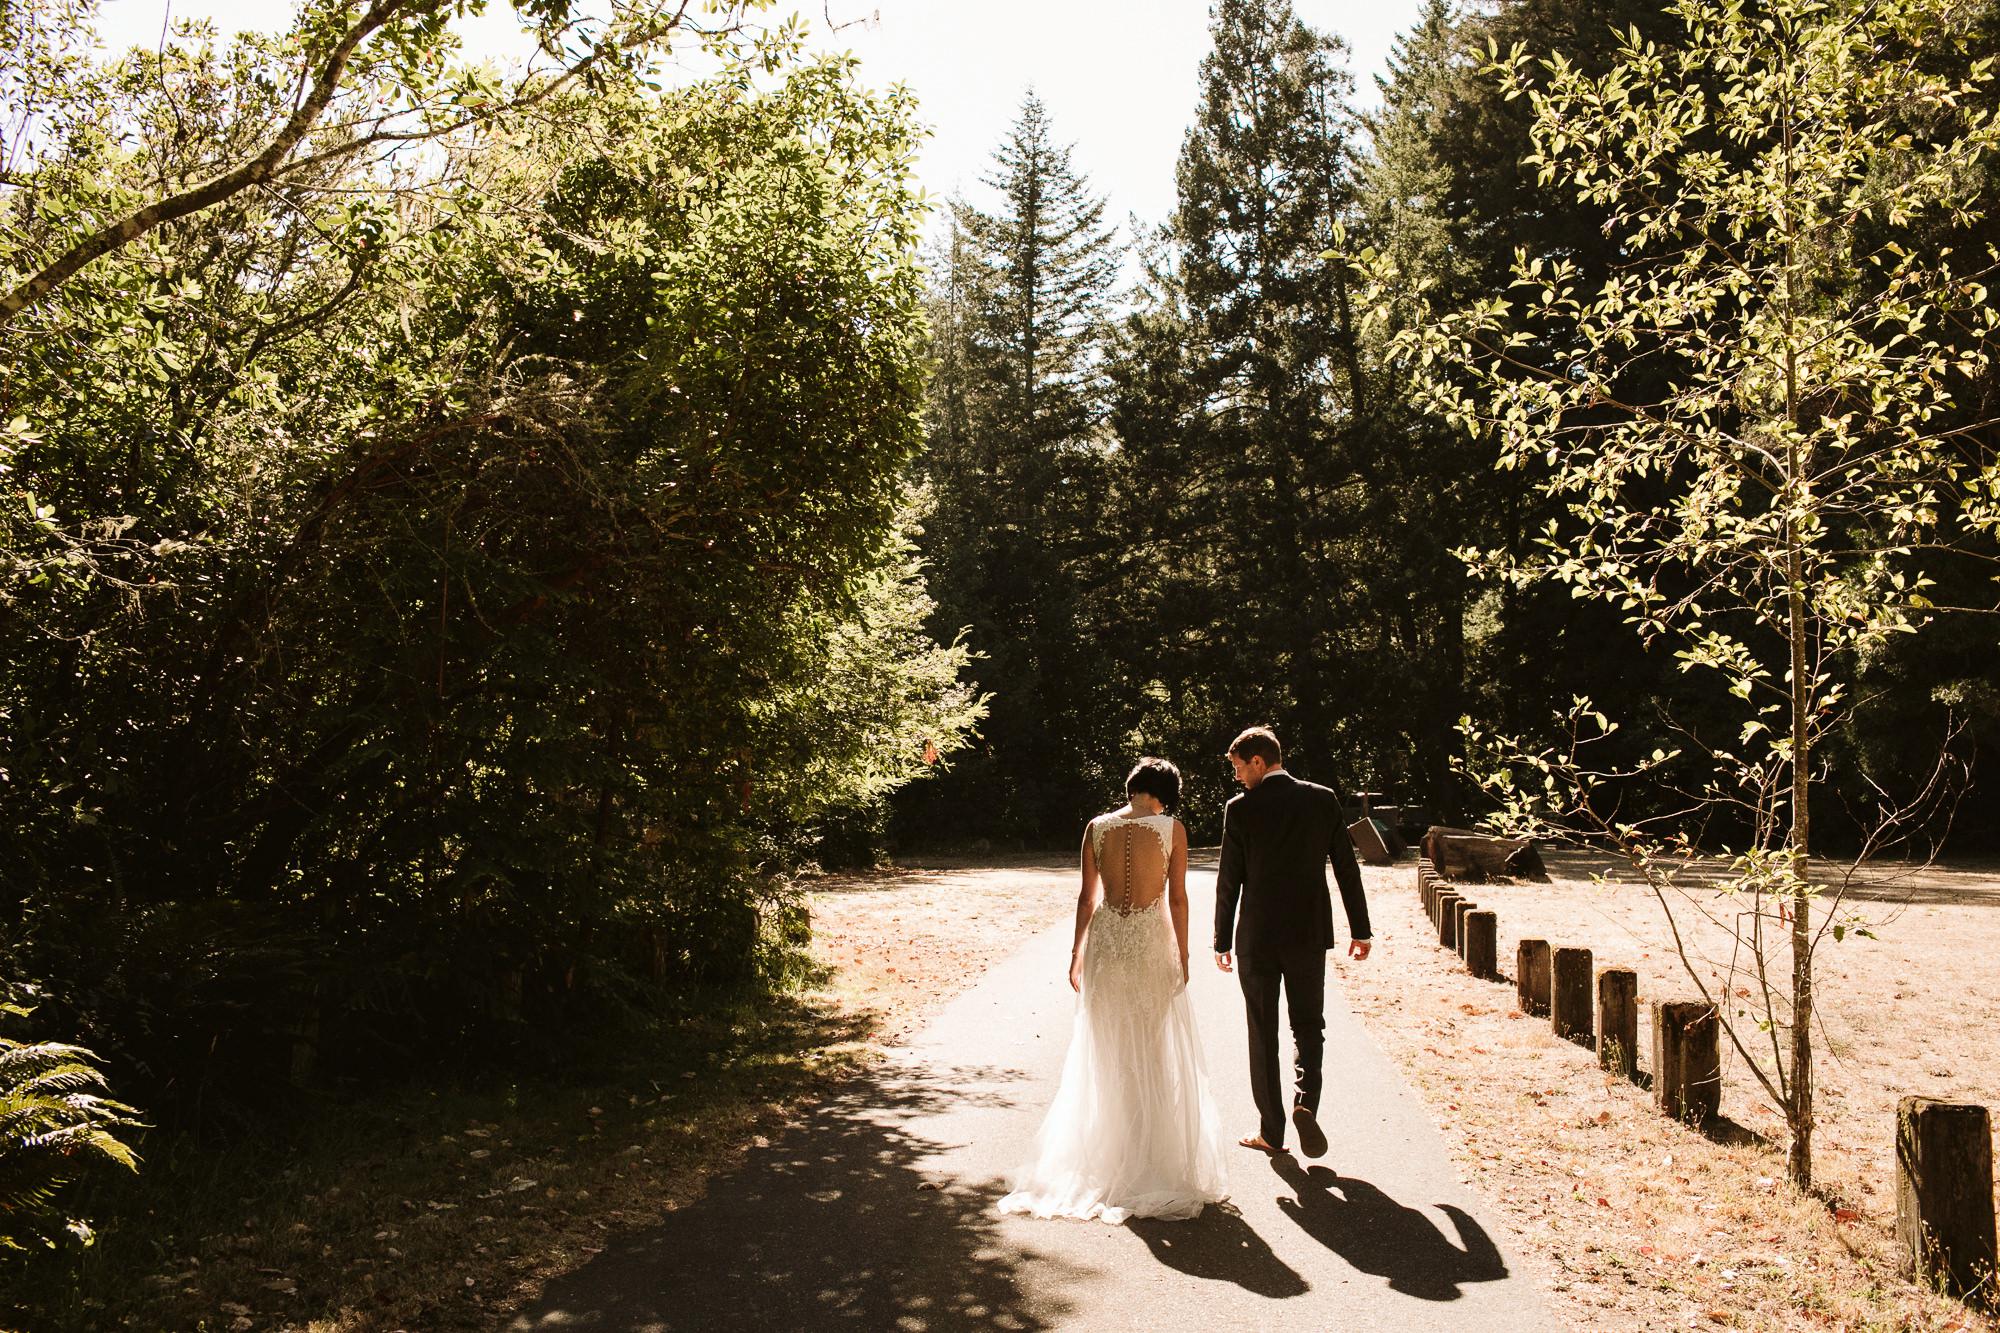 California-wedding-photographer-alfonso-flores-pamplin-groove-256.jpg